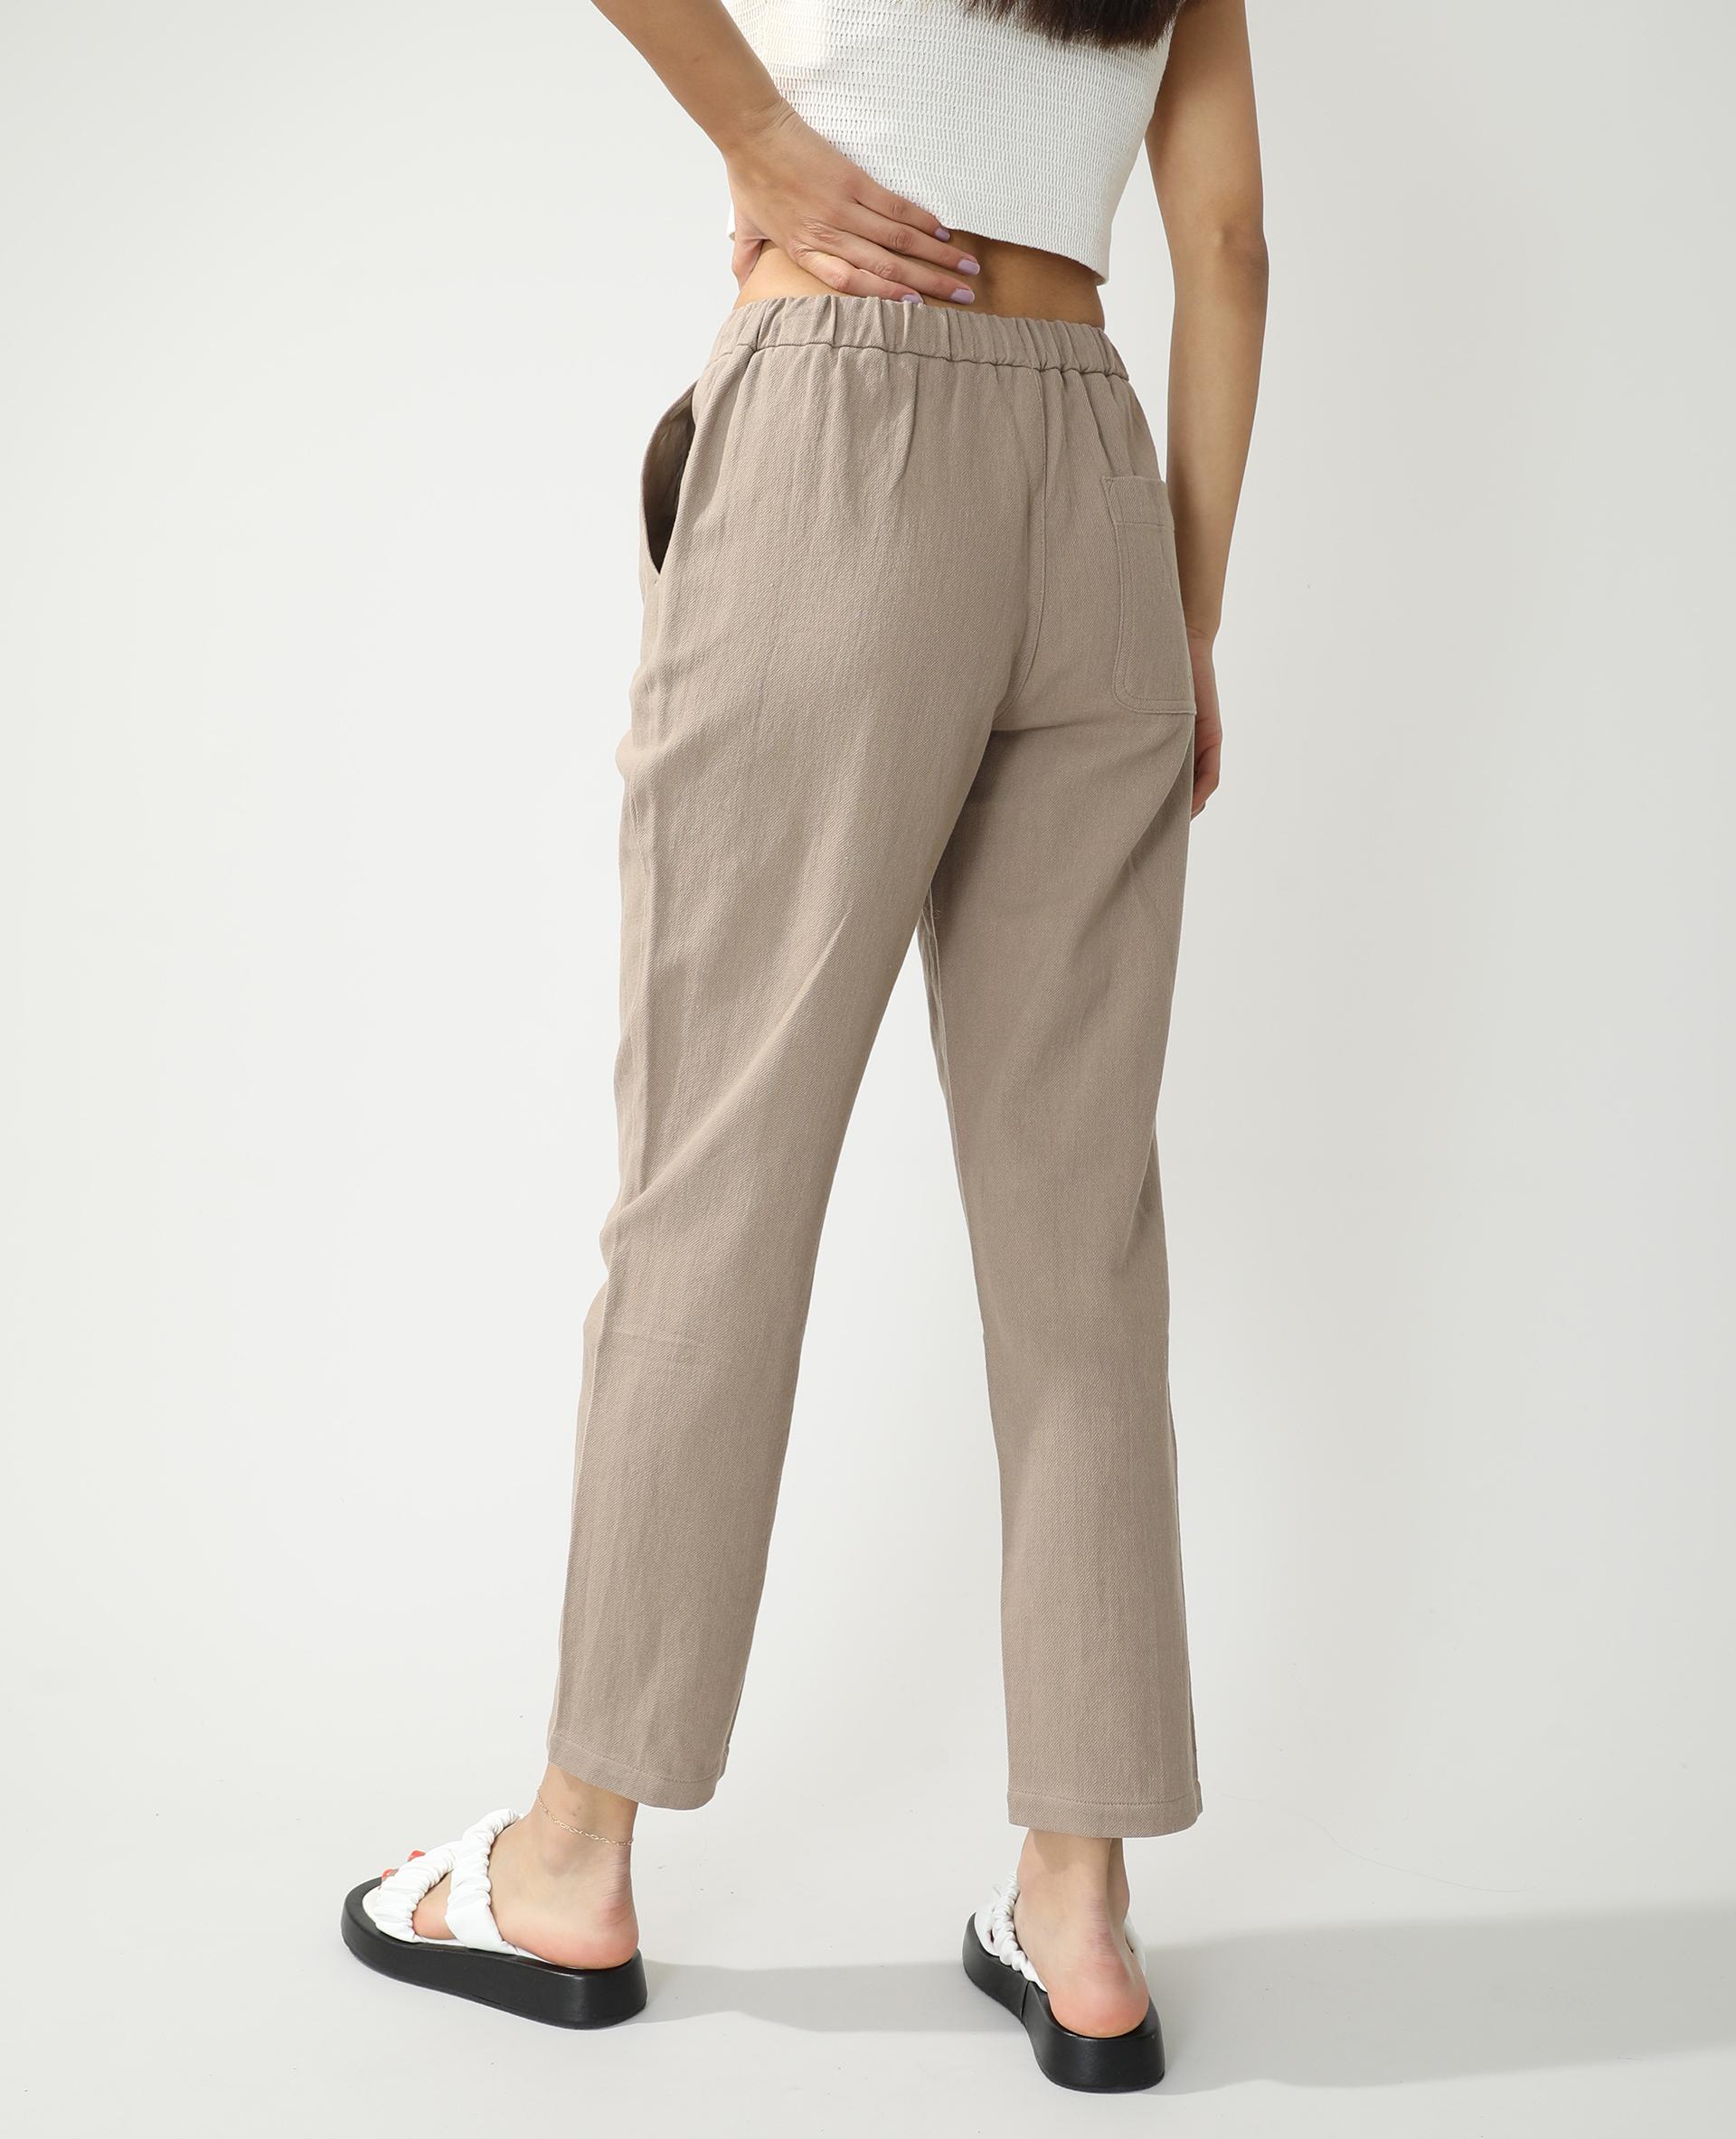 Pantalon jogging droit marron - Pimkie